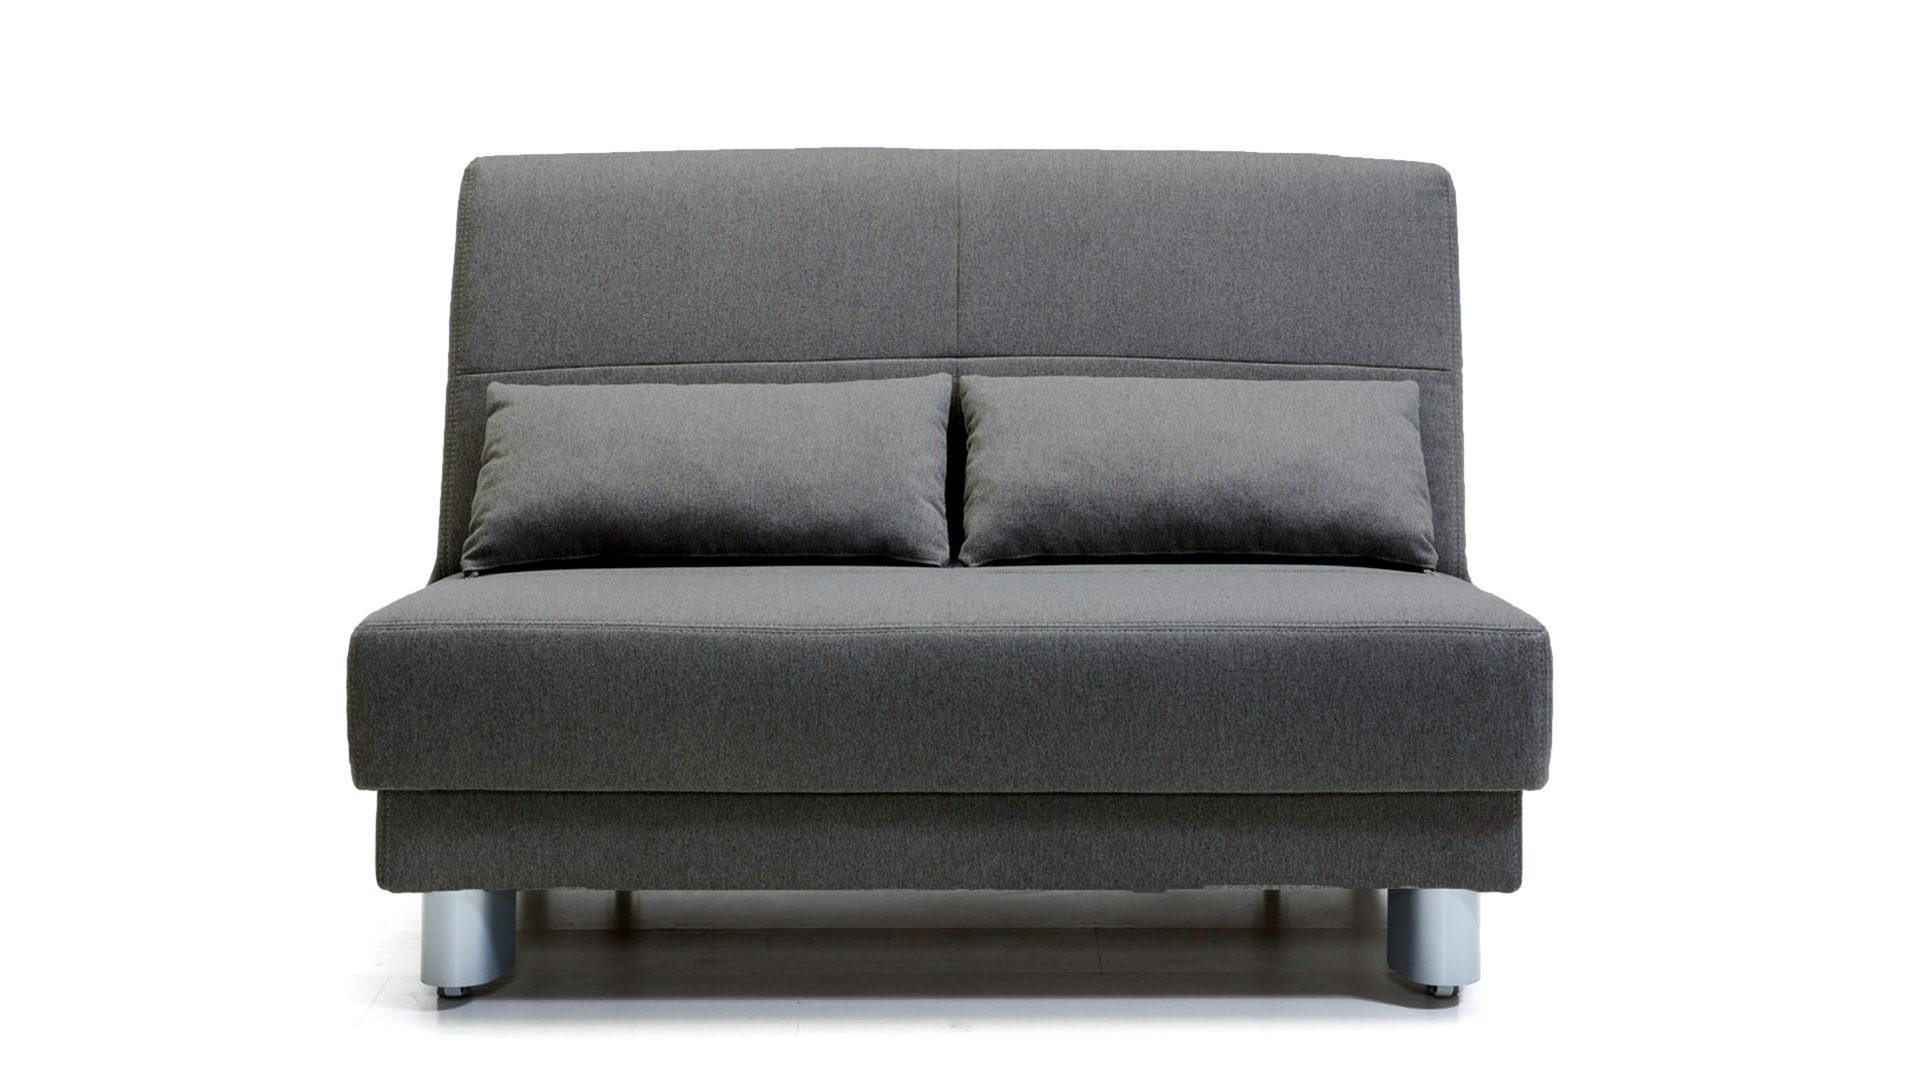 Aus Stoff Dunkelgrauer Bezug 22 33 Durban 9410 Alufarbene Metallfüße Breite Ca 120 Cm Sedaro Design In Grau Falt Schlafsofa